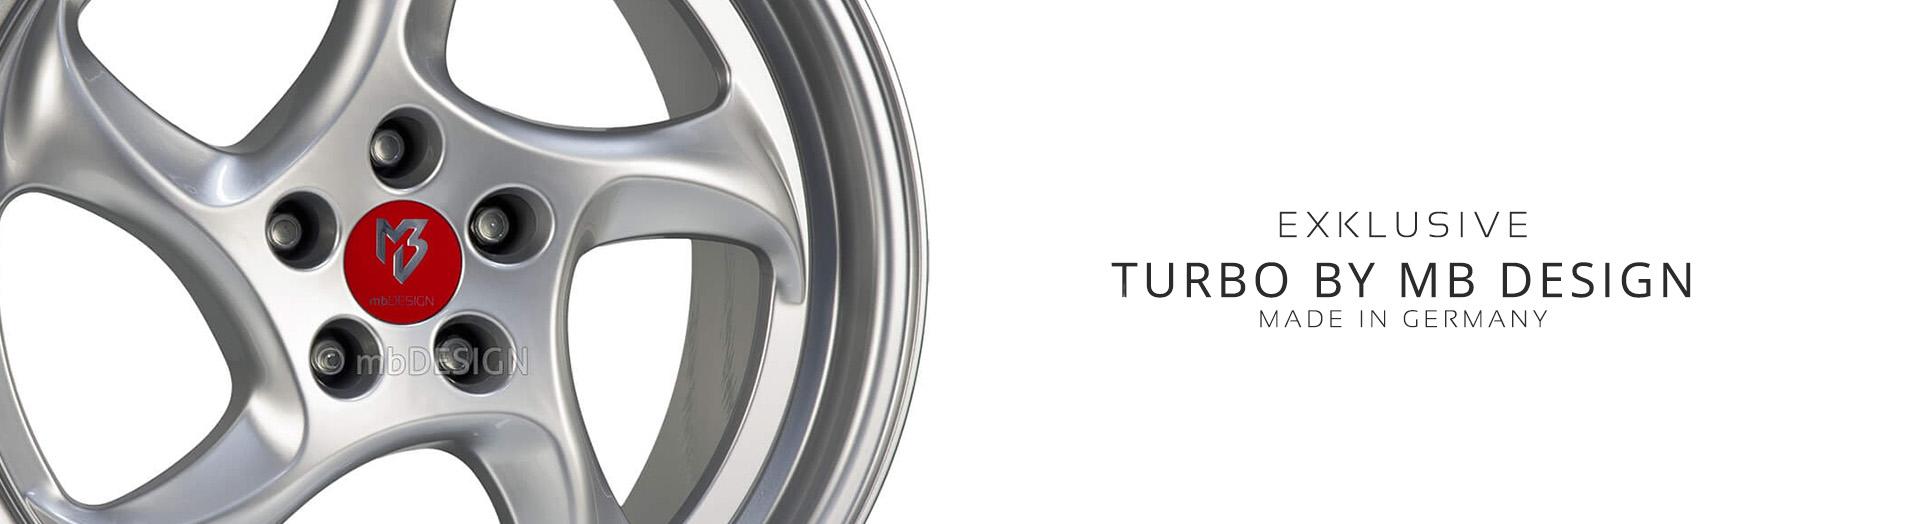 Turbo (1tlg) kaufen bei MB Design Felgen Online Shop